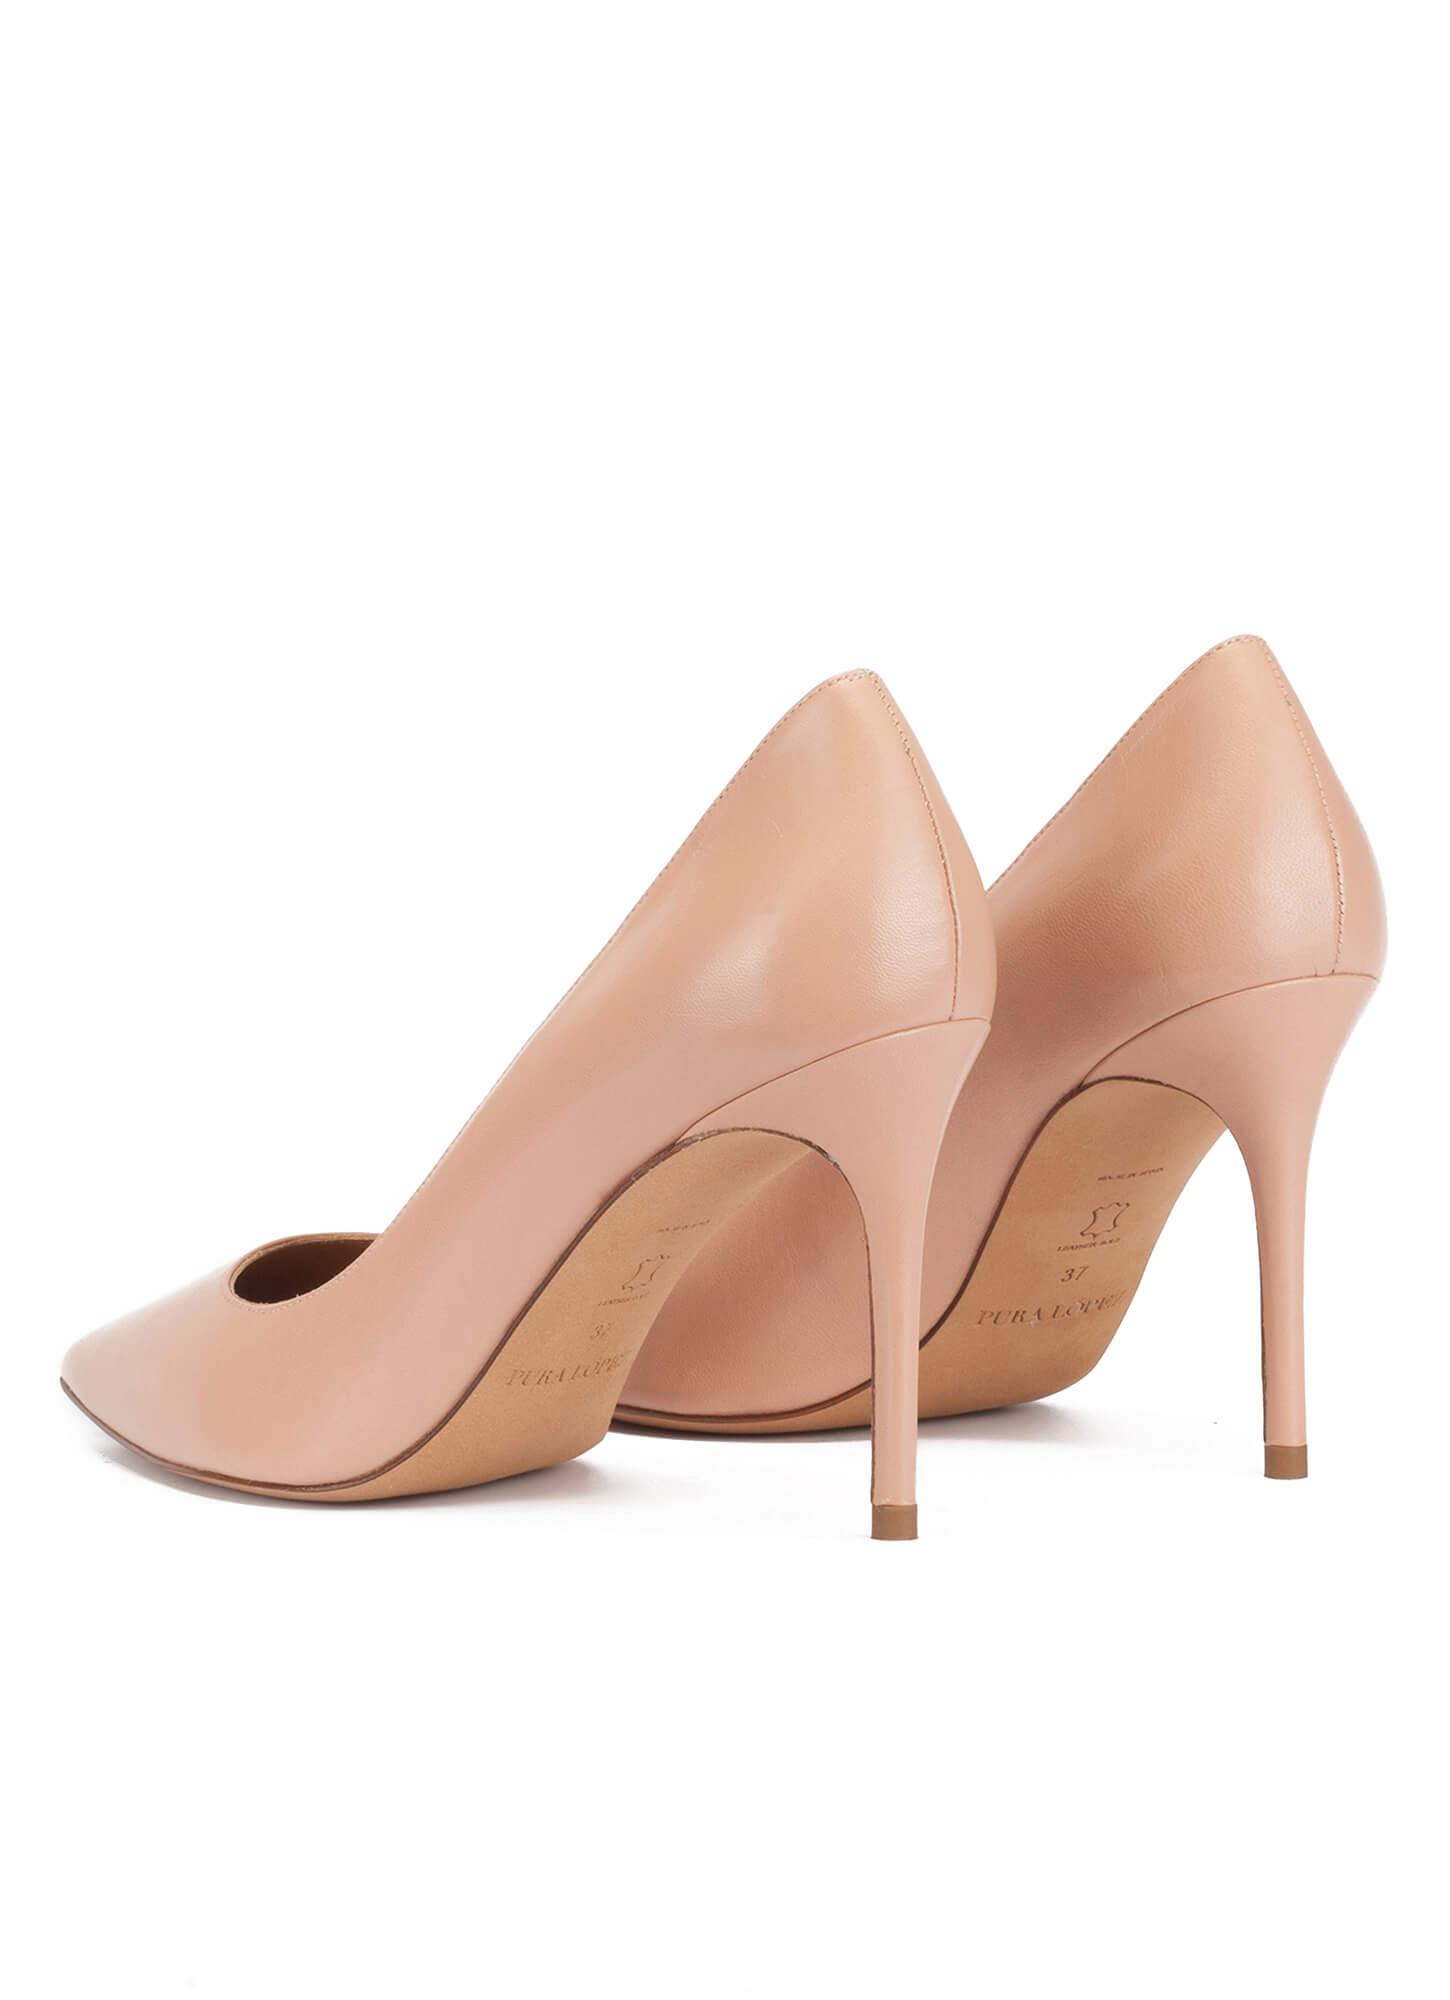 Point-toe high heel pumps in nude leather . PURA LOPEZ ef036af563bb2